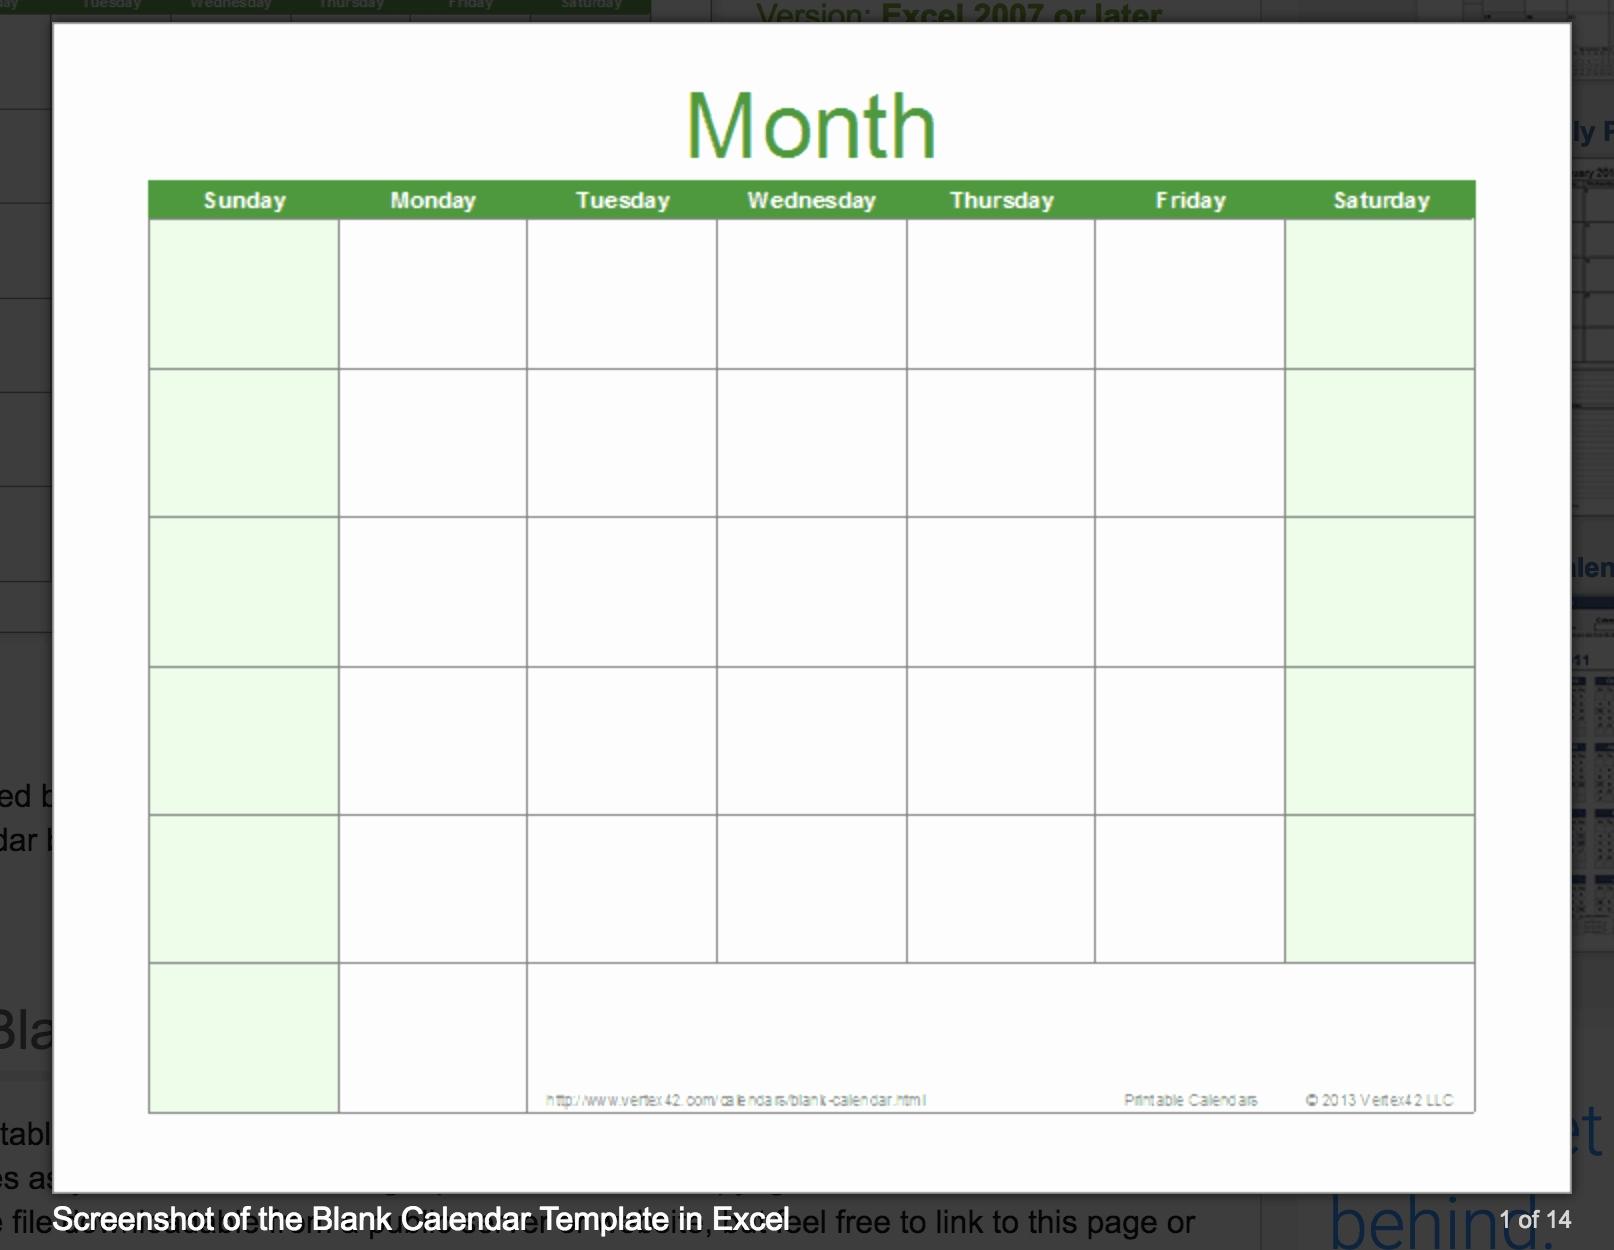 Lovely 46 Sample Excel Calendar Templates Free 2019 | Tumblr-Calendar Templates By Vertex42.com